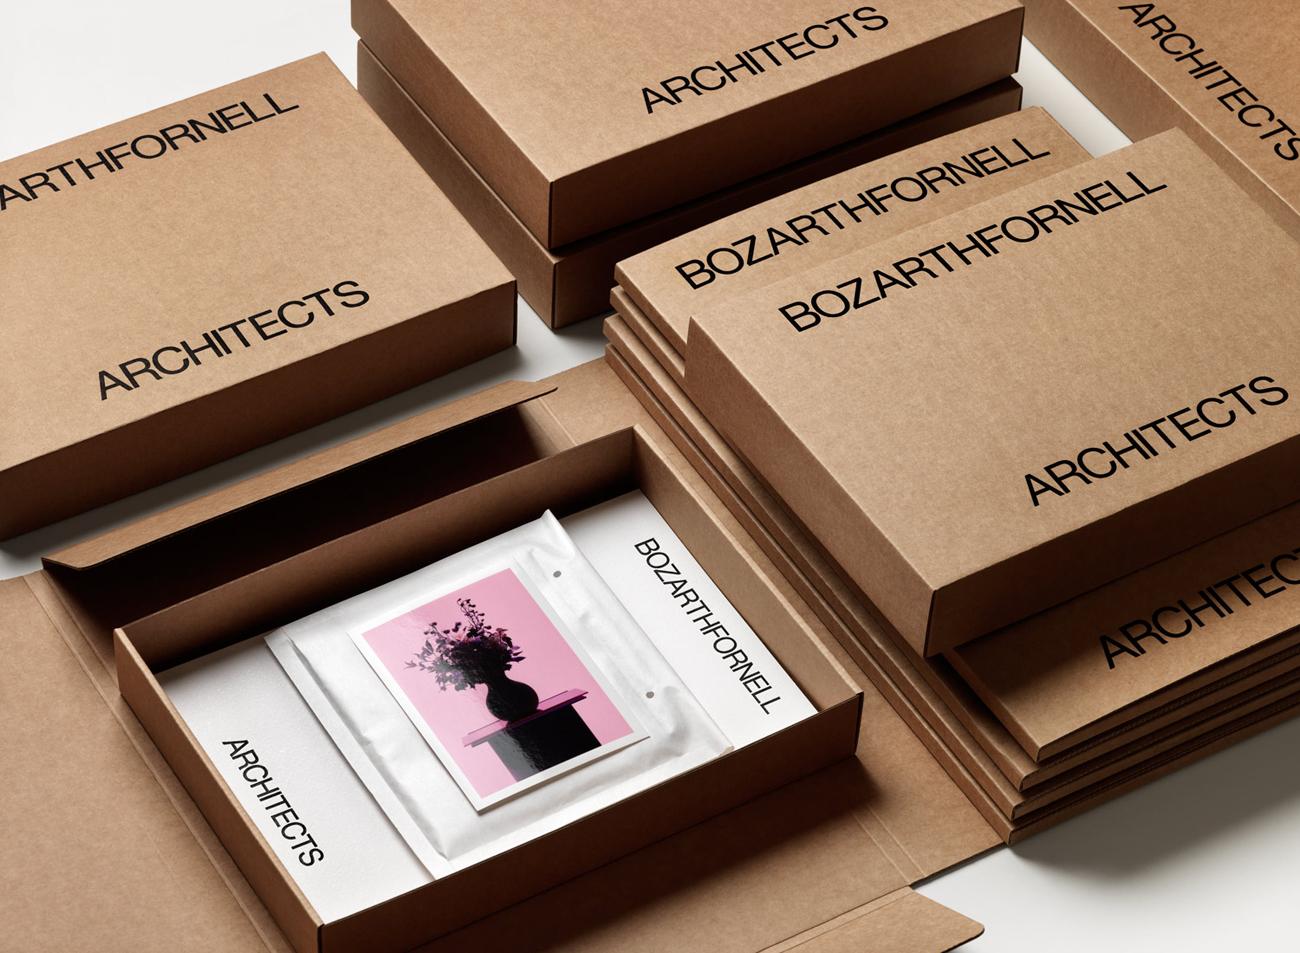 Architekten Corporate Identity